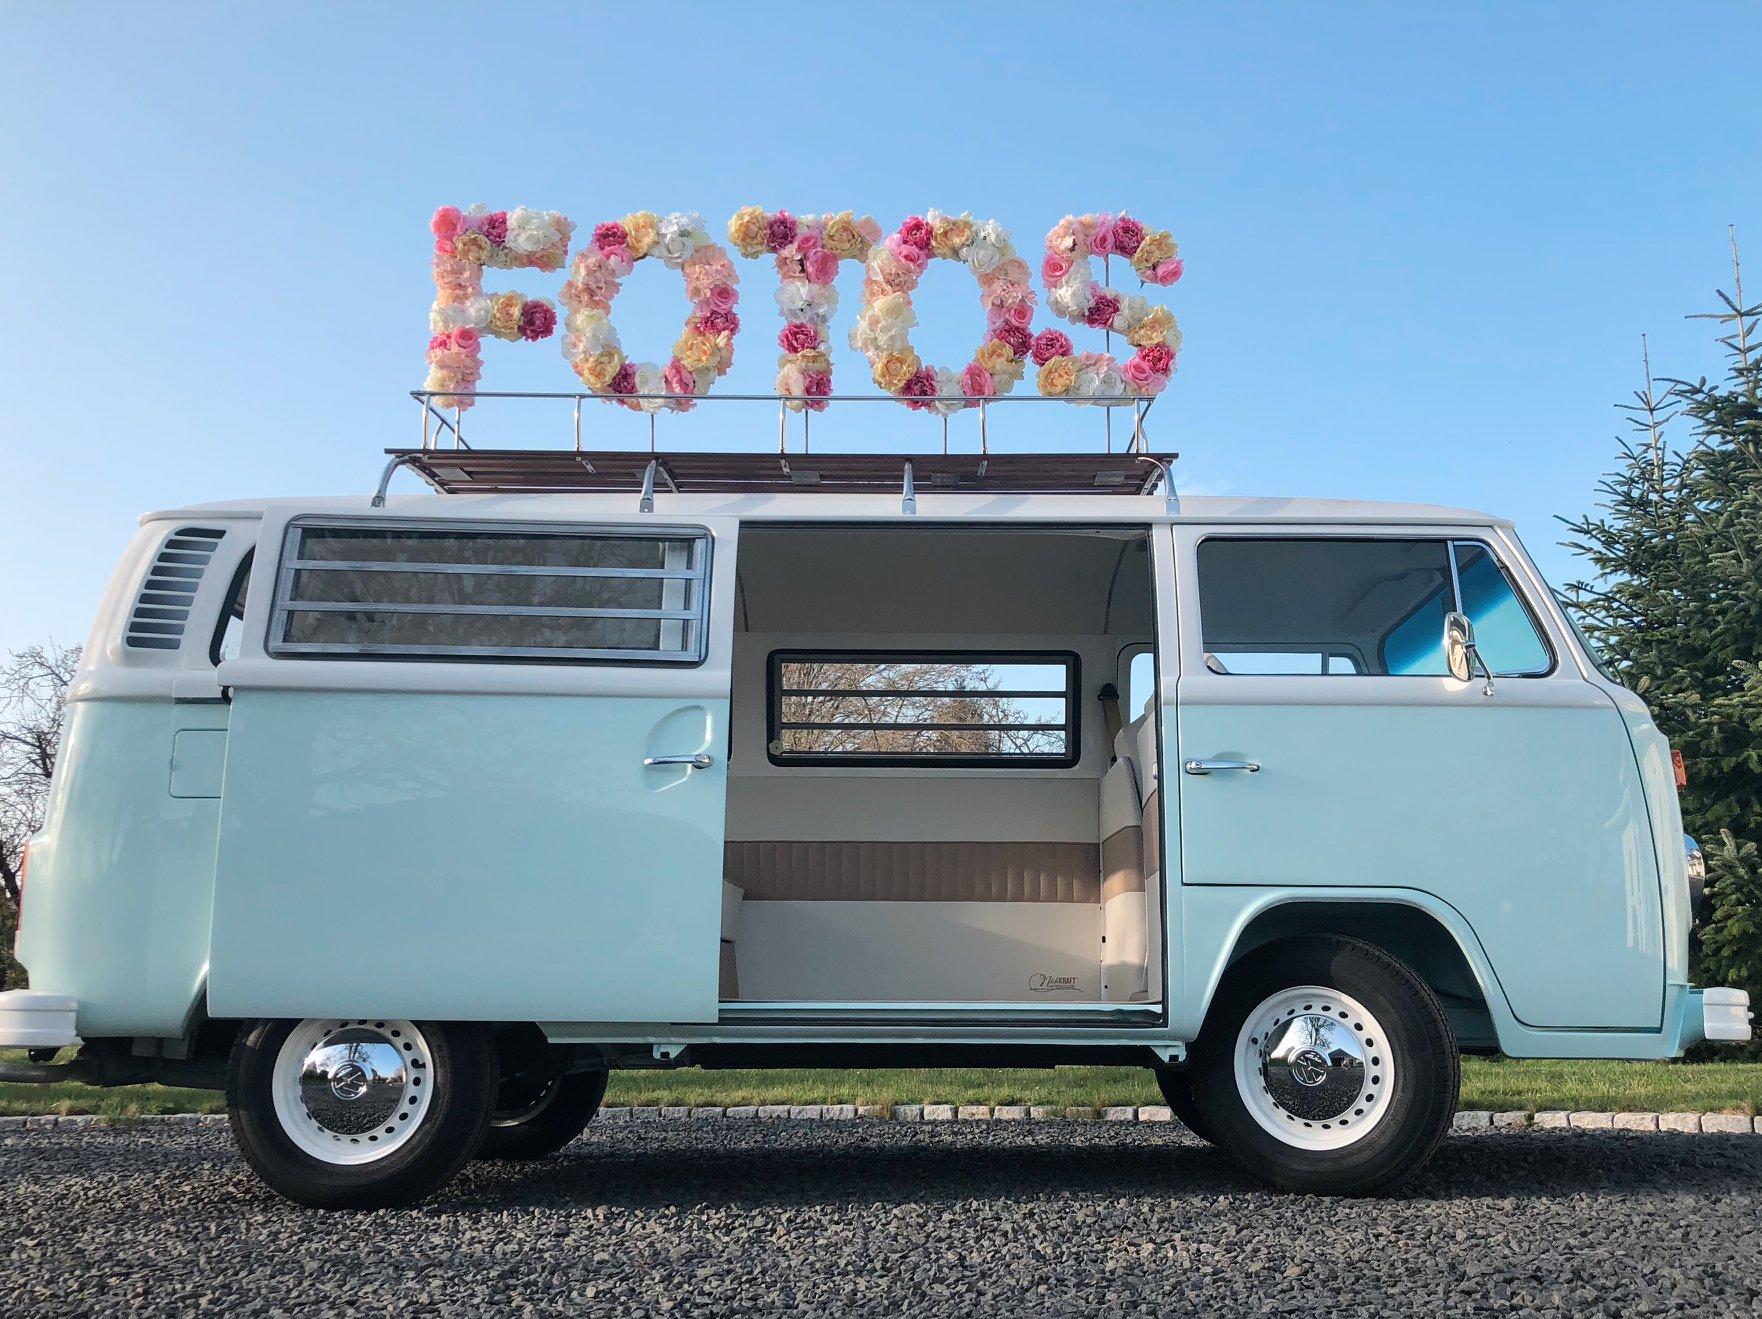 fotobus mieten in k ln frankfurt dar ber hinaus der selfiebus. Black Bedroom Furniture Sets. Home Design Ideas